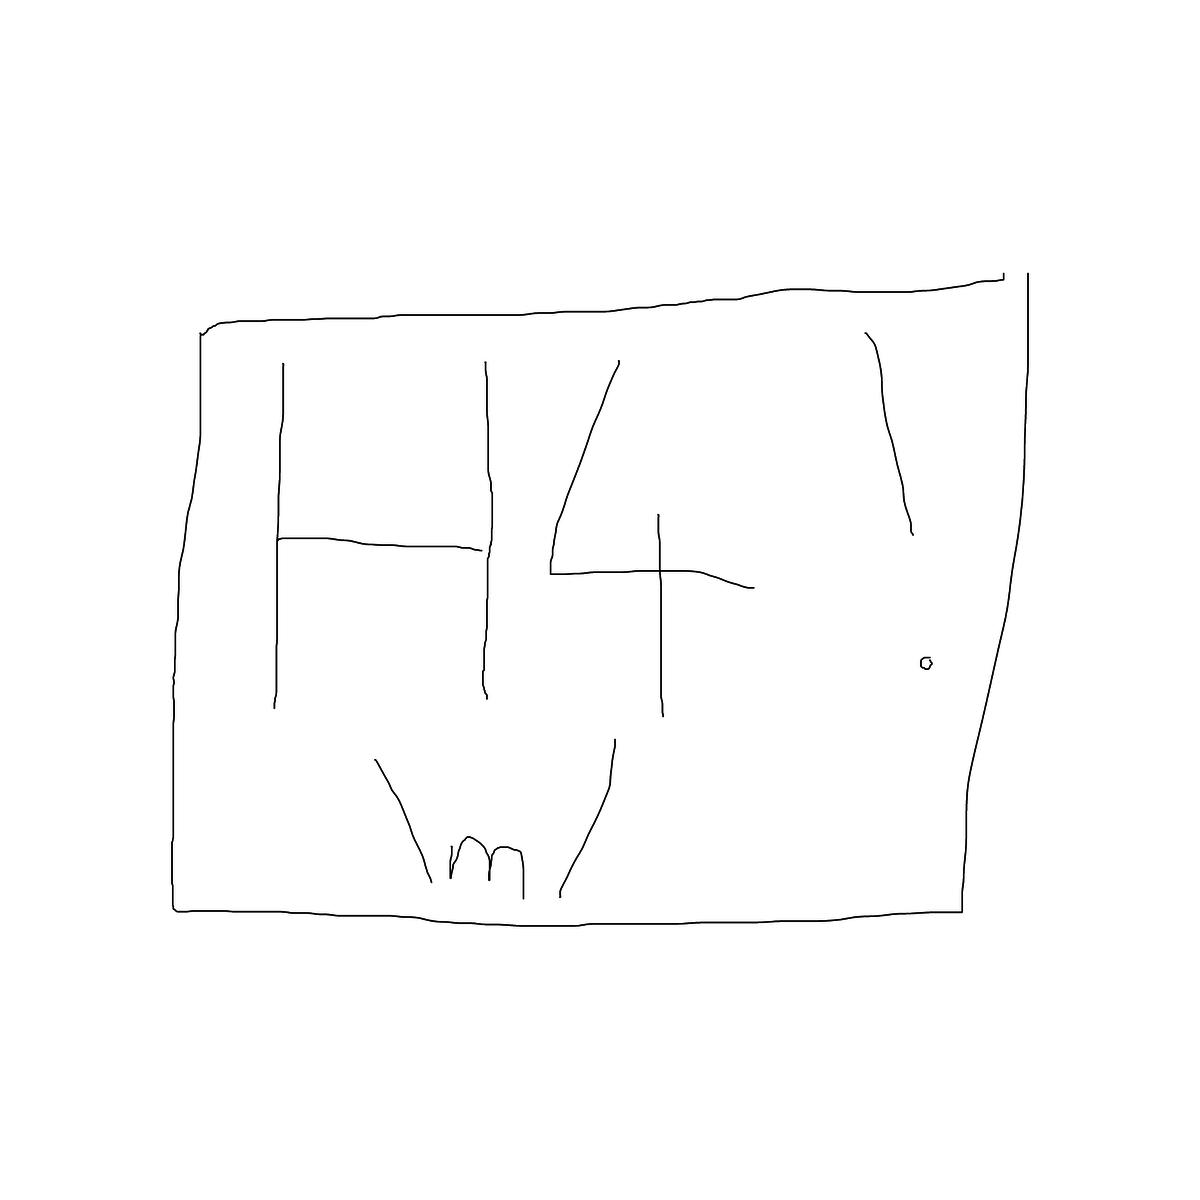 BAAAM drawing#5024 lat:48.8458824157714840lng: 2.3477833271026610